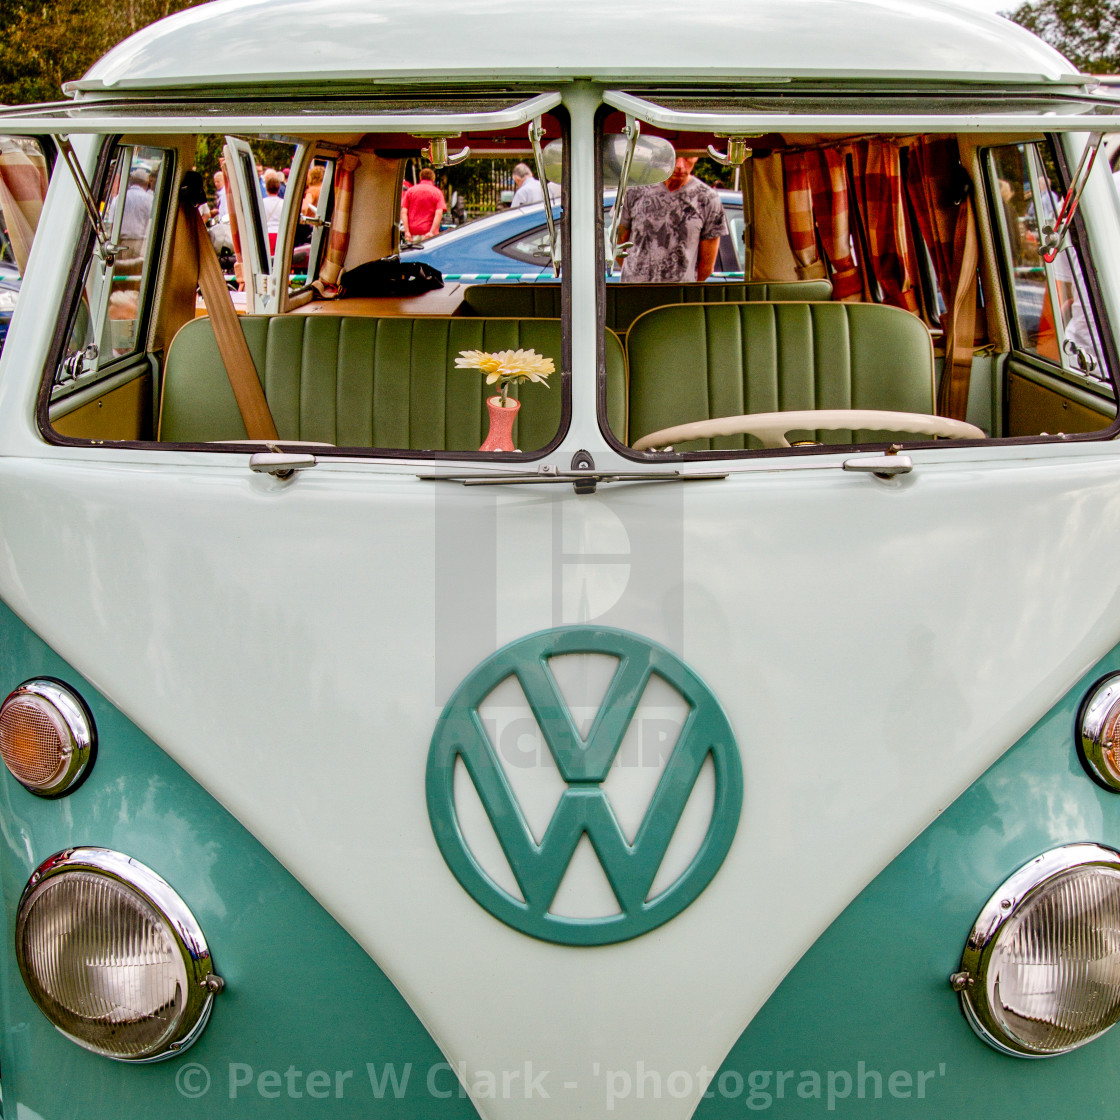 """Volkswagon Campervan on Display at Otley 2012 Vintage Transport Extravaganza"" stock image"